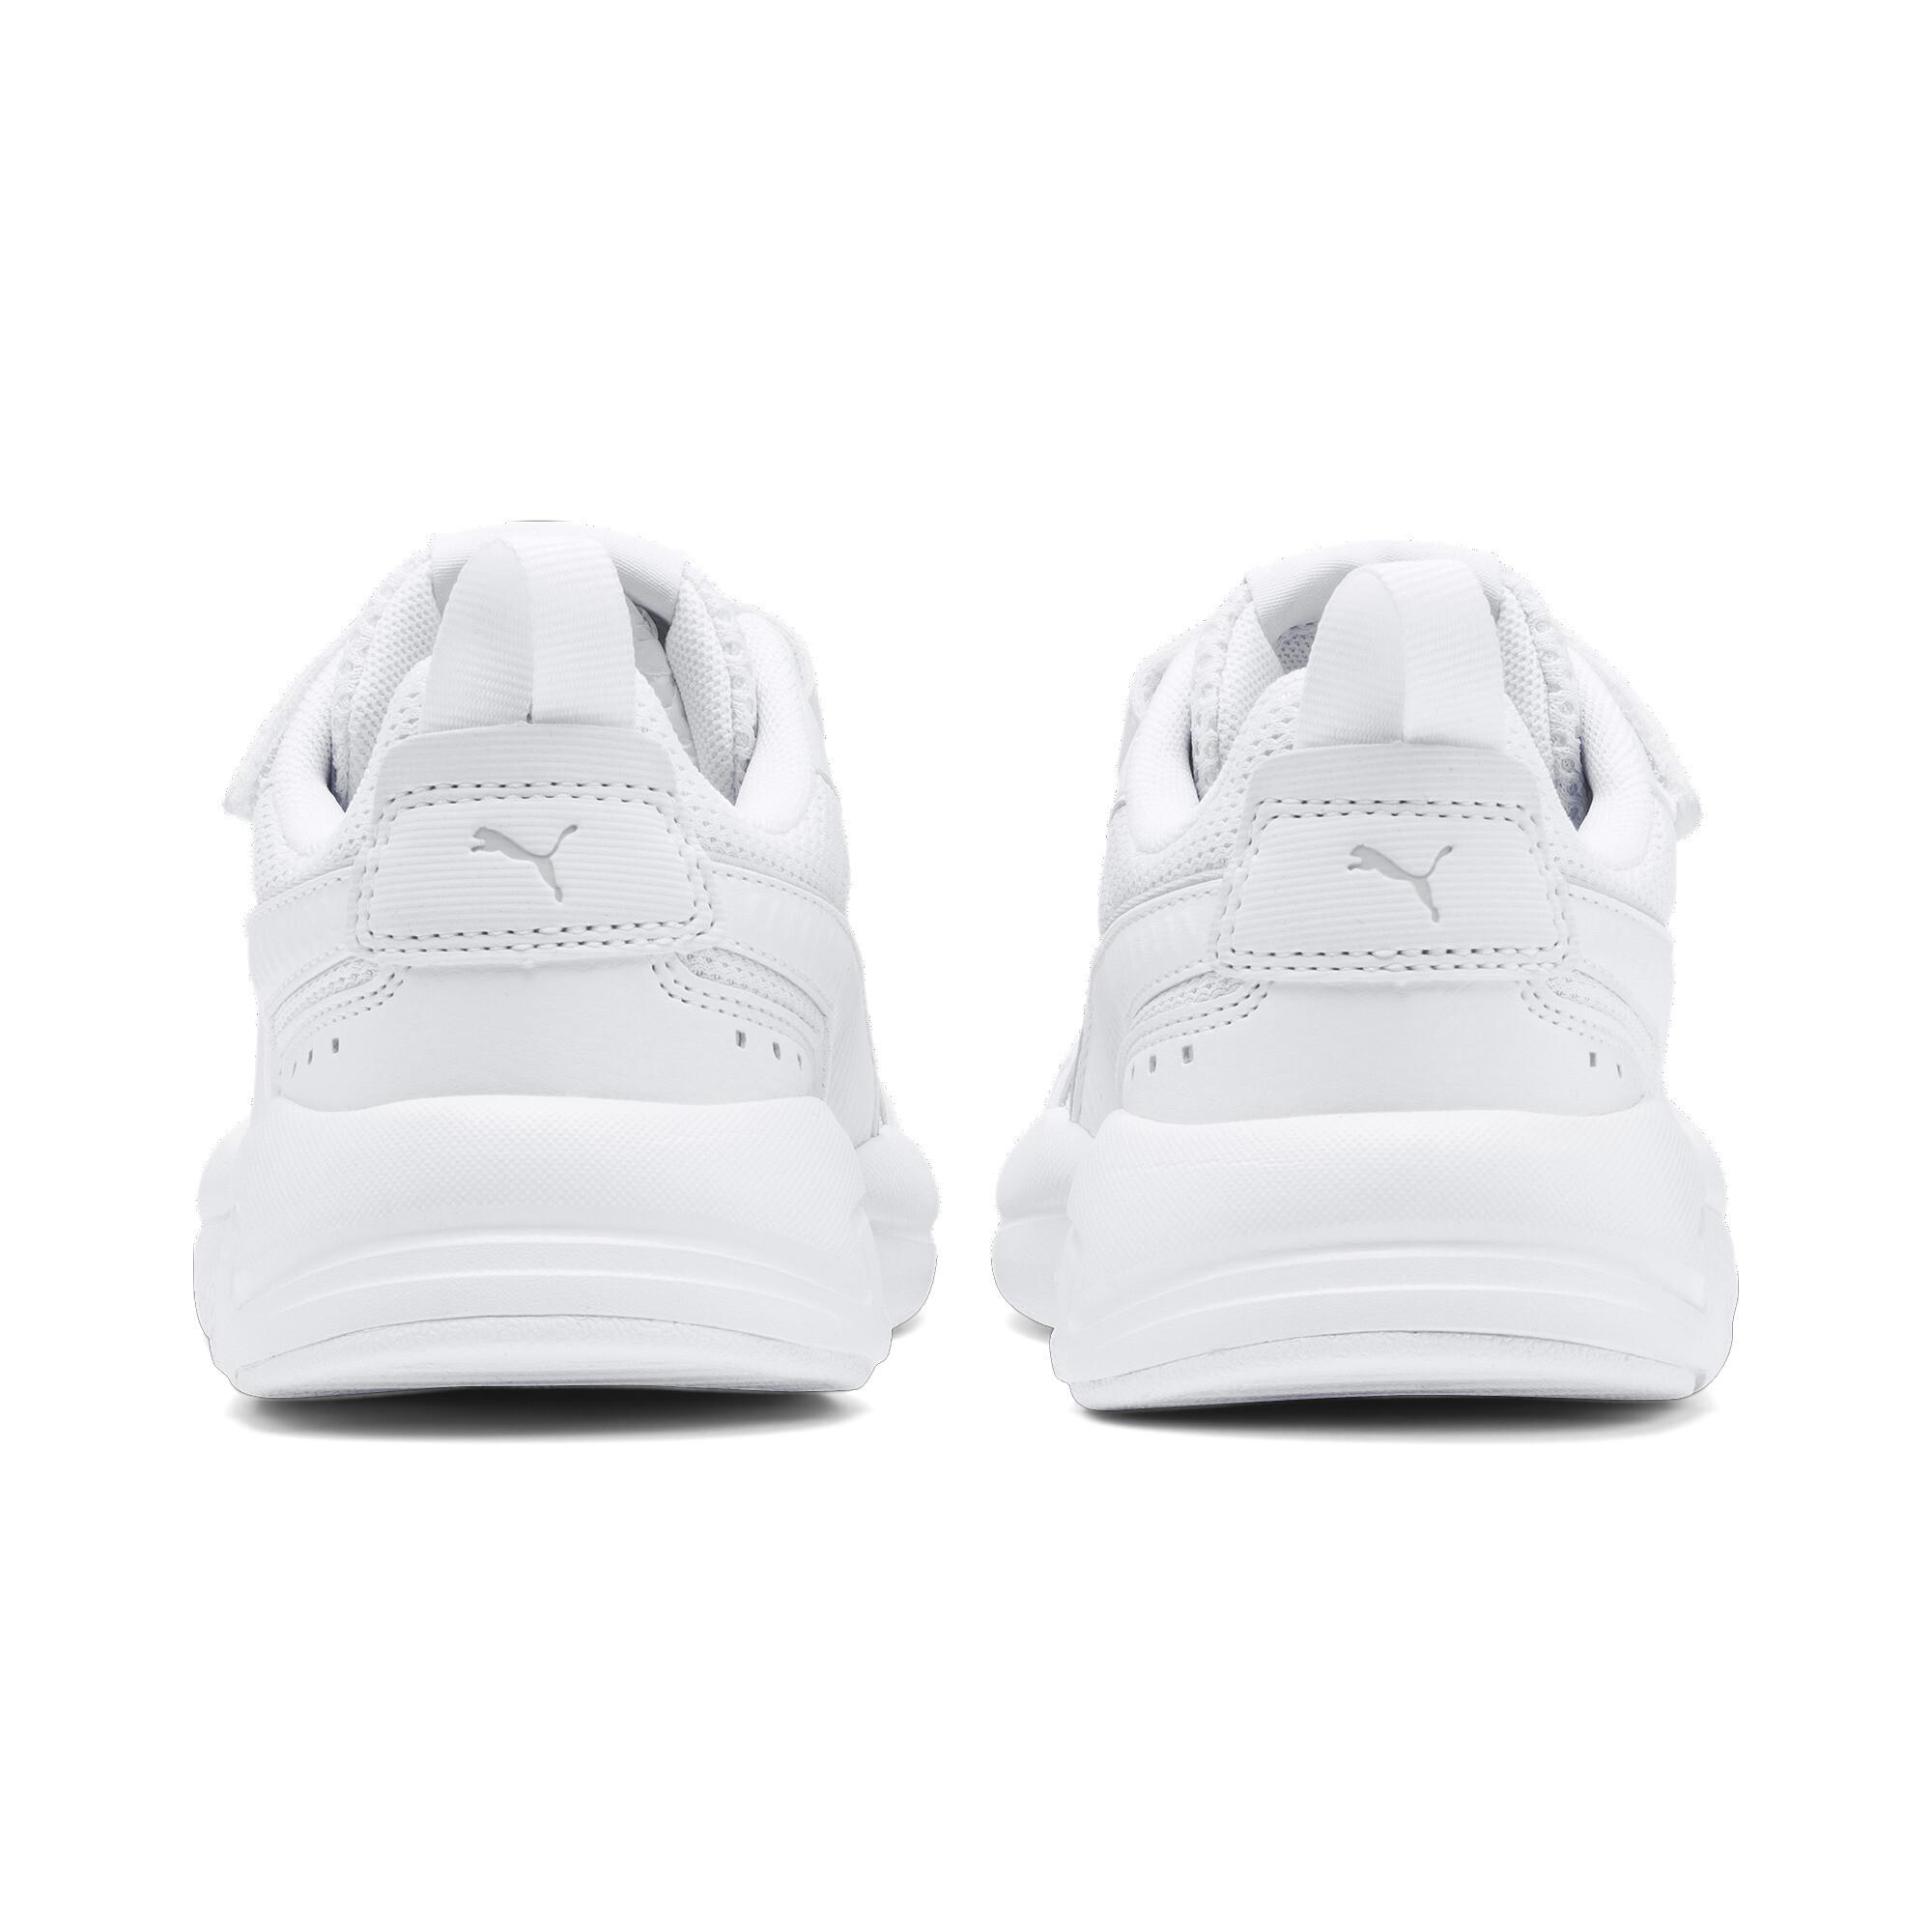 PUMA-X-RAY-Little-Kids-039-Shoes-Kids-Shoe-Kids thumbnail 9